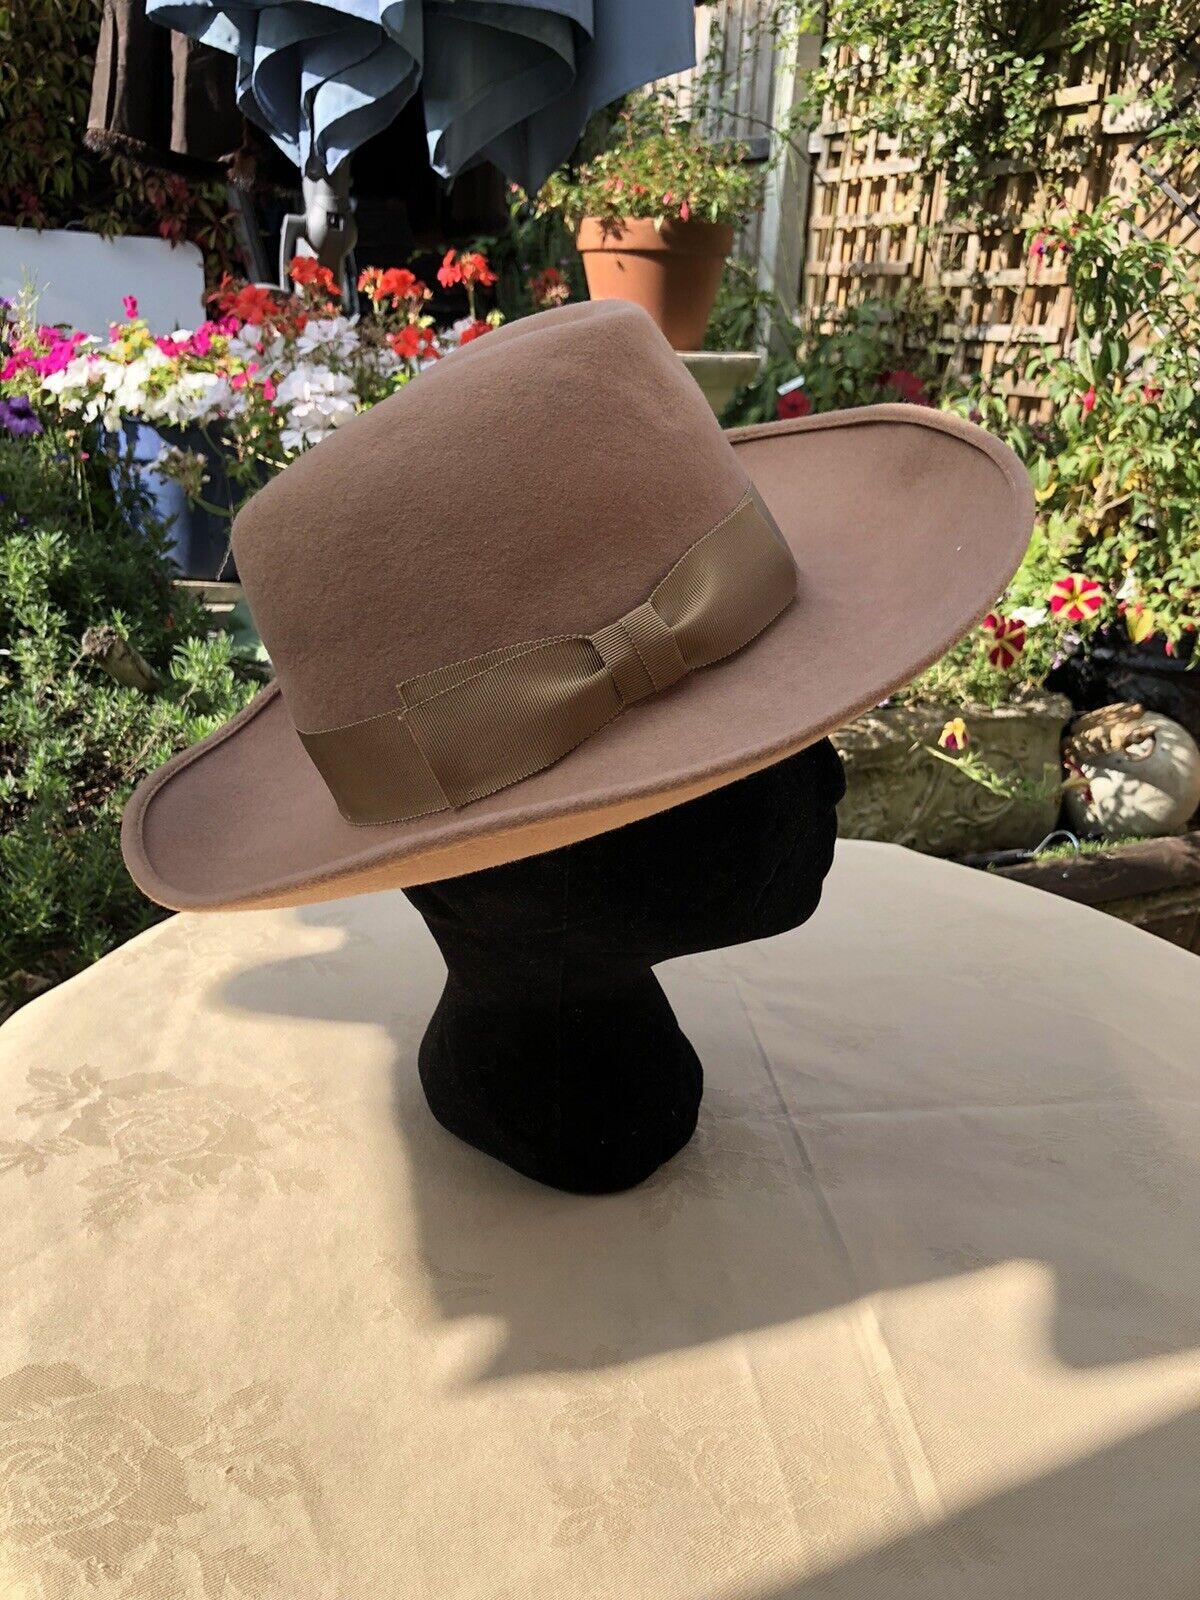 Peter Bettley pure wool Brown stunning Winter hat 55cm